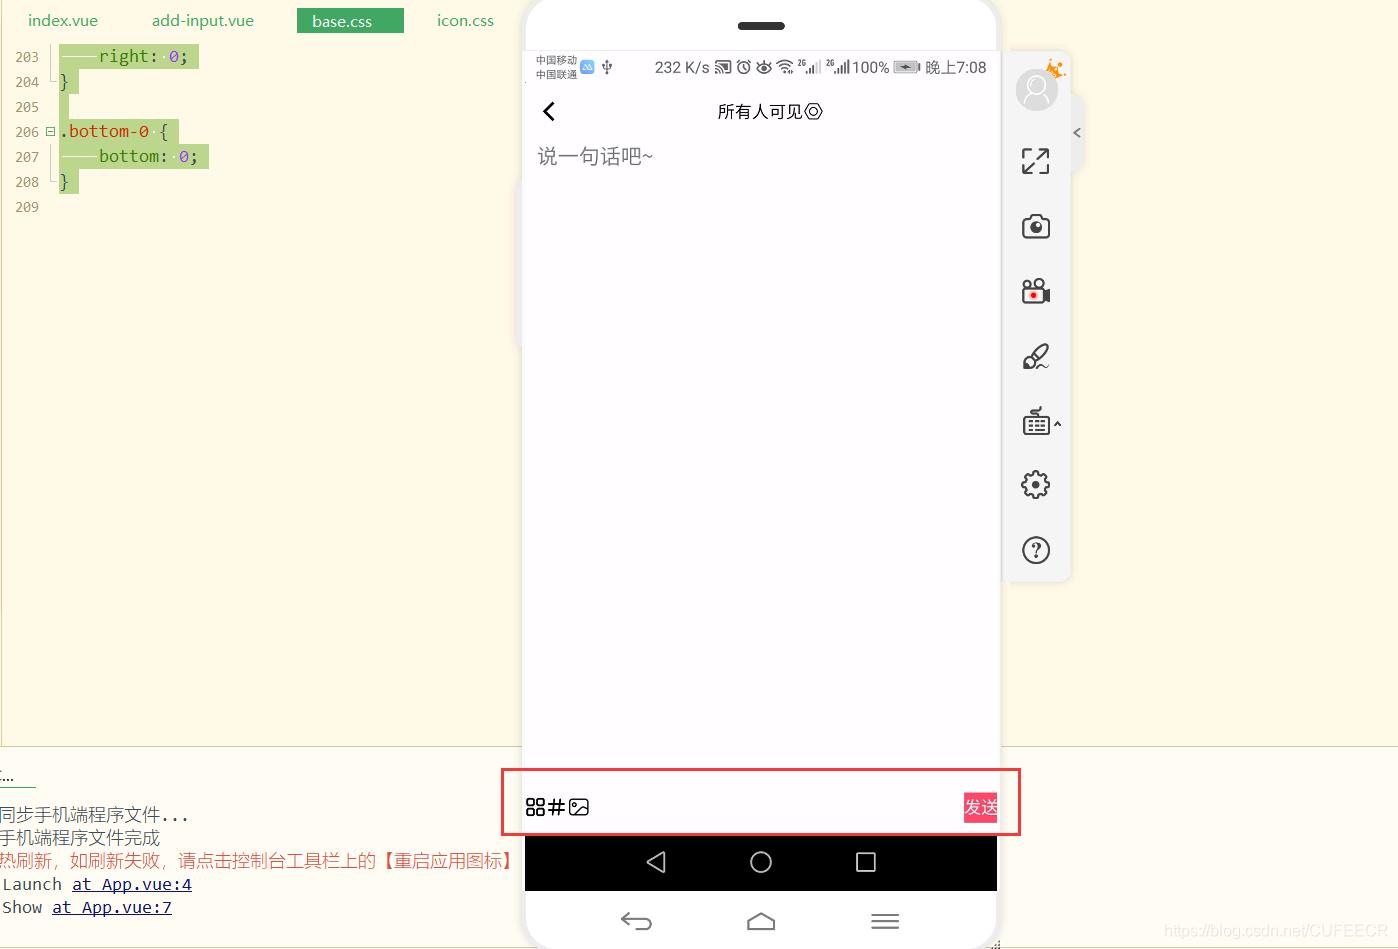 uniapp social app post develop bottom first